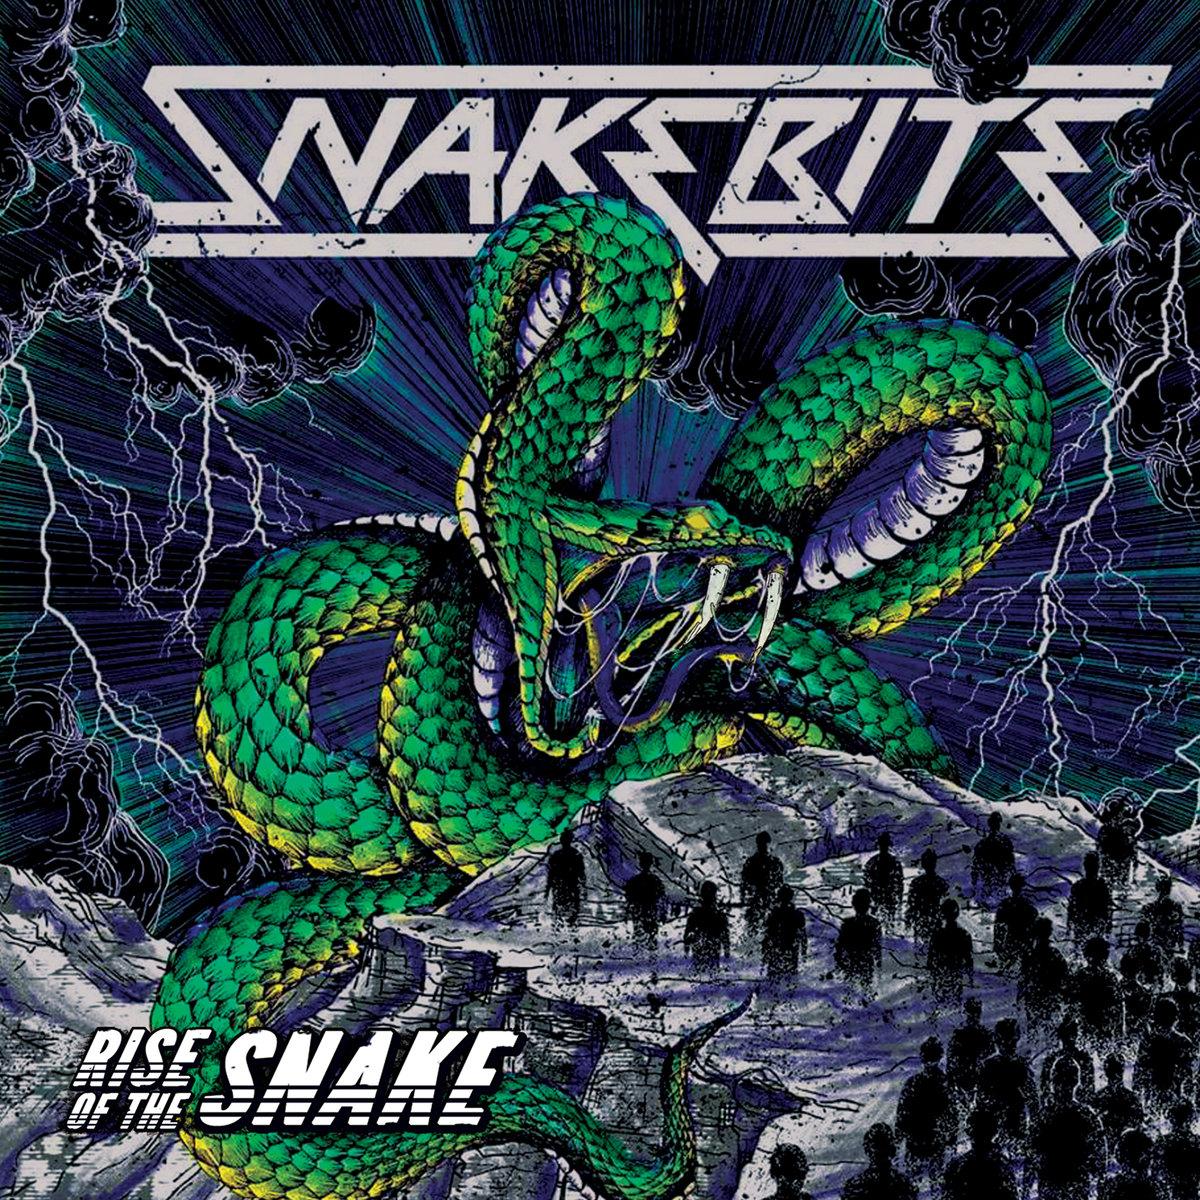 SNAKEBITE Rise Of The Snake (2018) Hard-Rock ALLEMAGNE A0962410